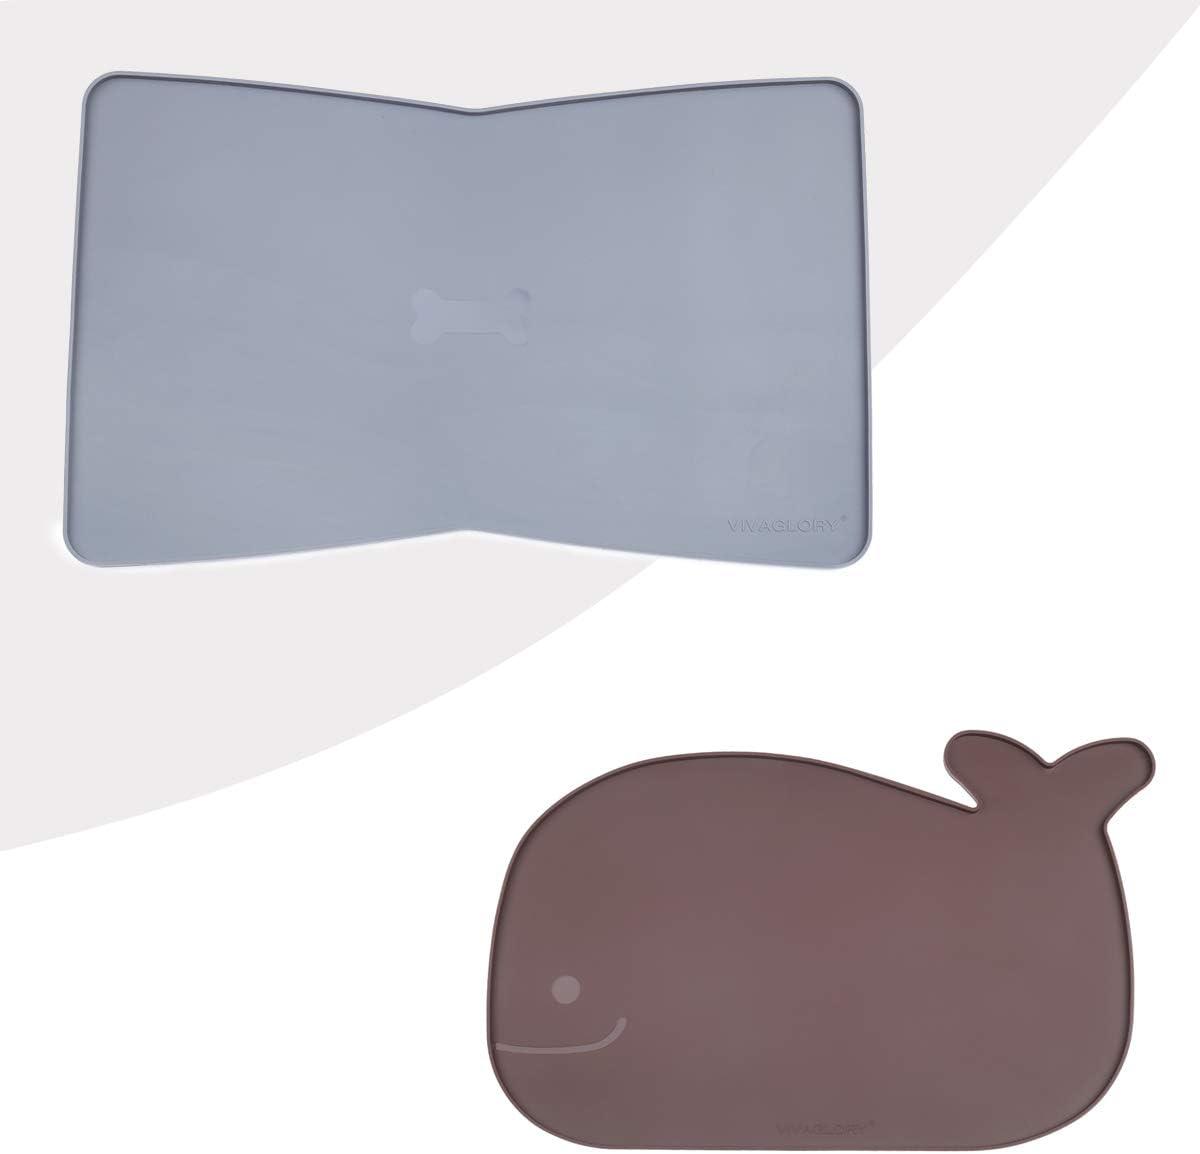 Vivaglory Bowknot-Shaped Pet Feeding Mat+Whale-Shaped Pet Feeding Mat